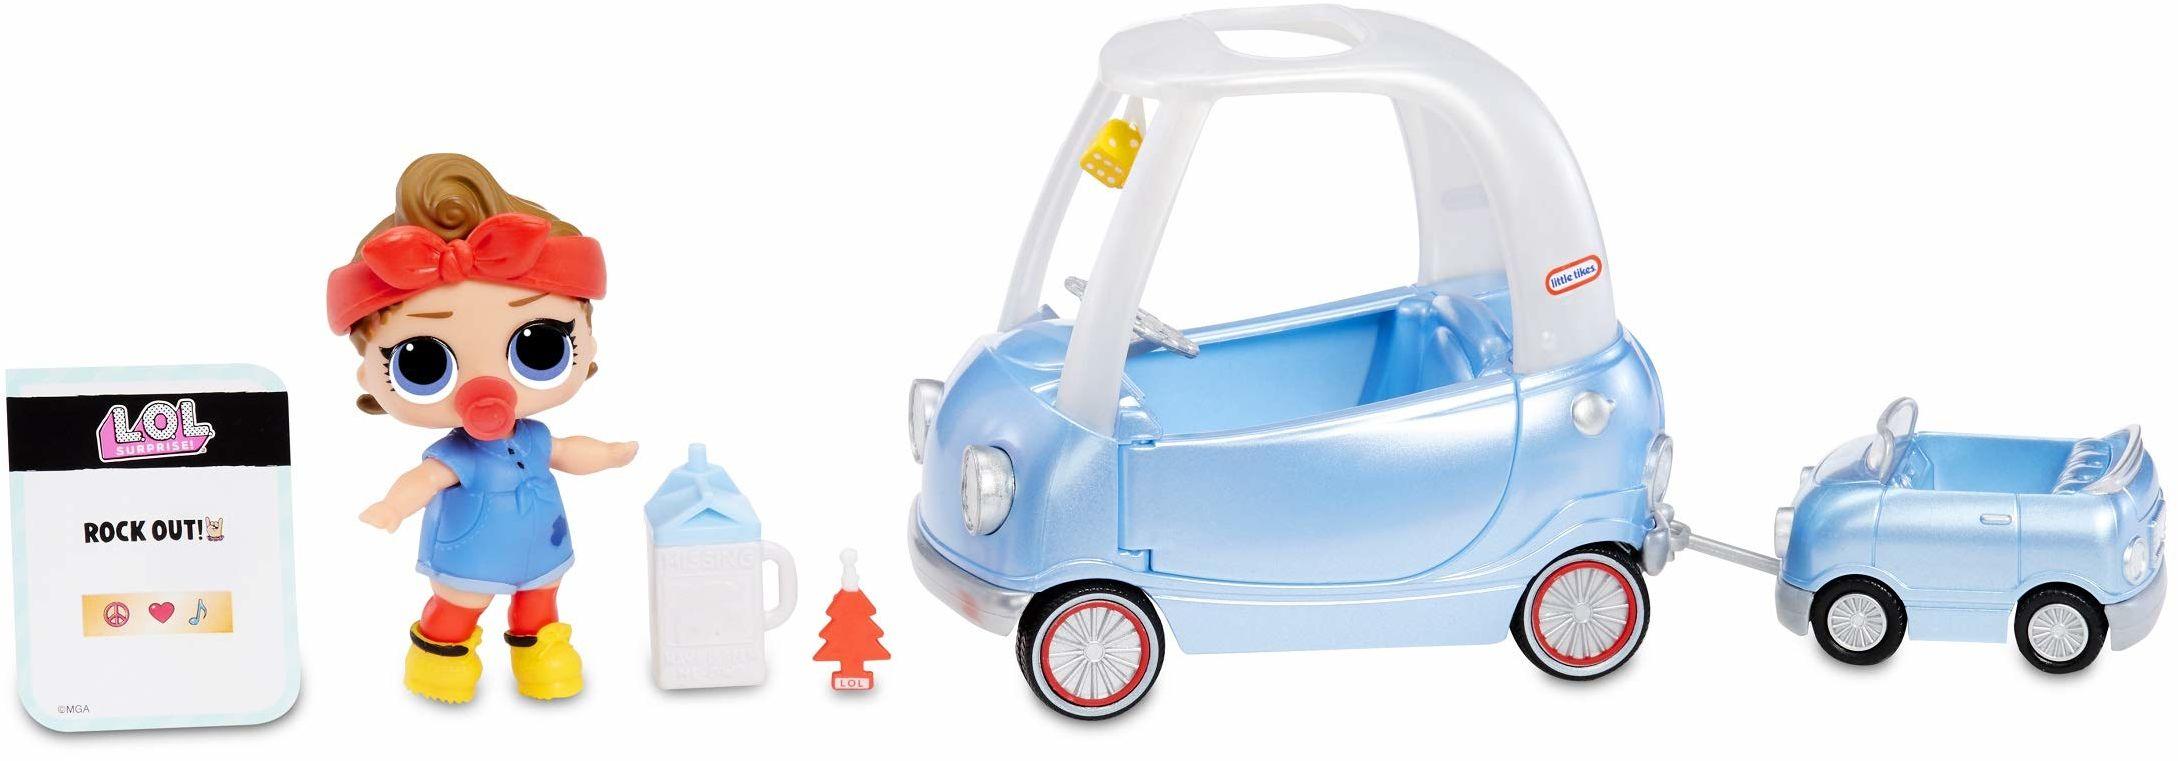 L.O.L. Surprise! 564928E7C Furniture  mebel dla lalek i figurka kolekcjonerska z akcesoriami Road-Trip z Can Do Baby, 10 niespodzianek